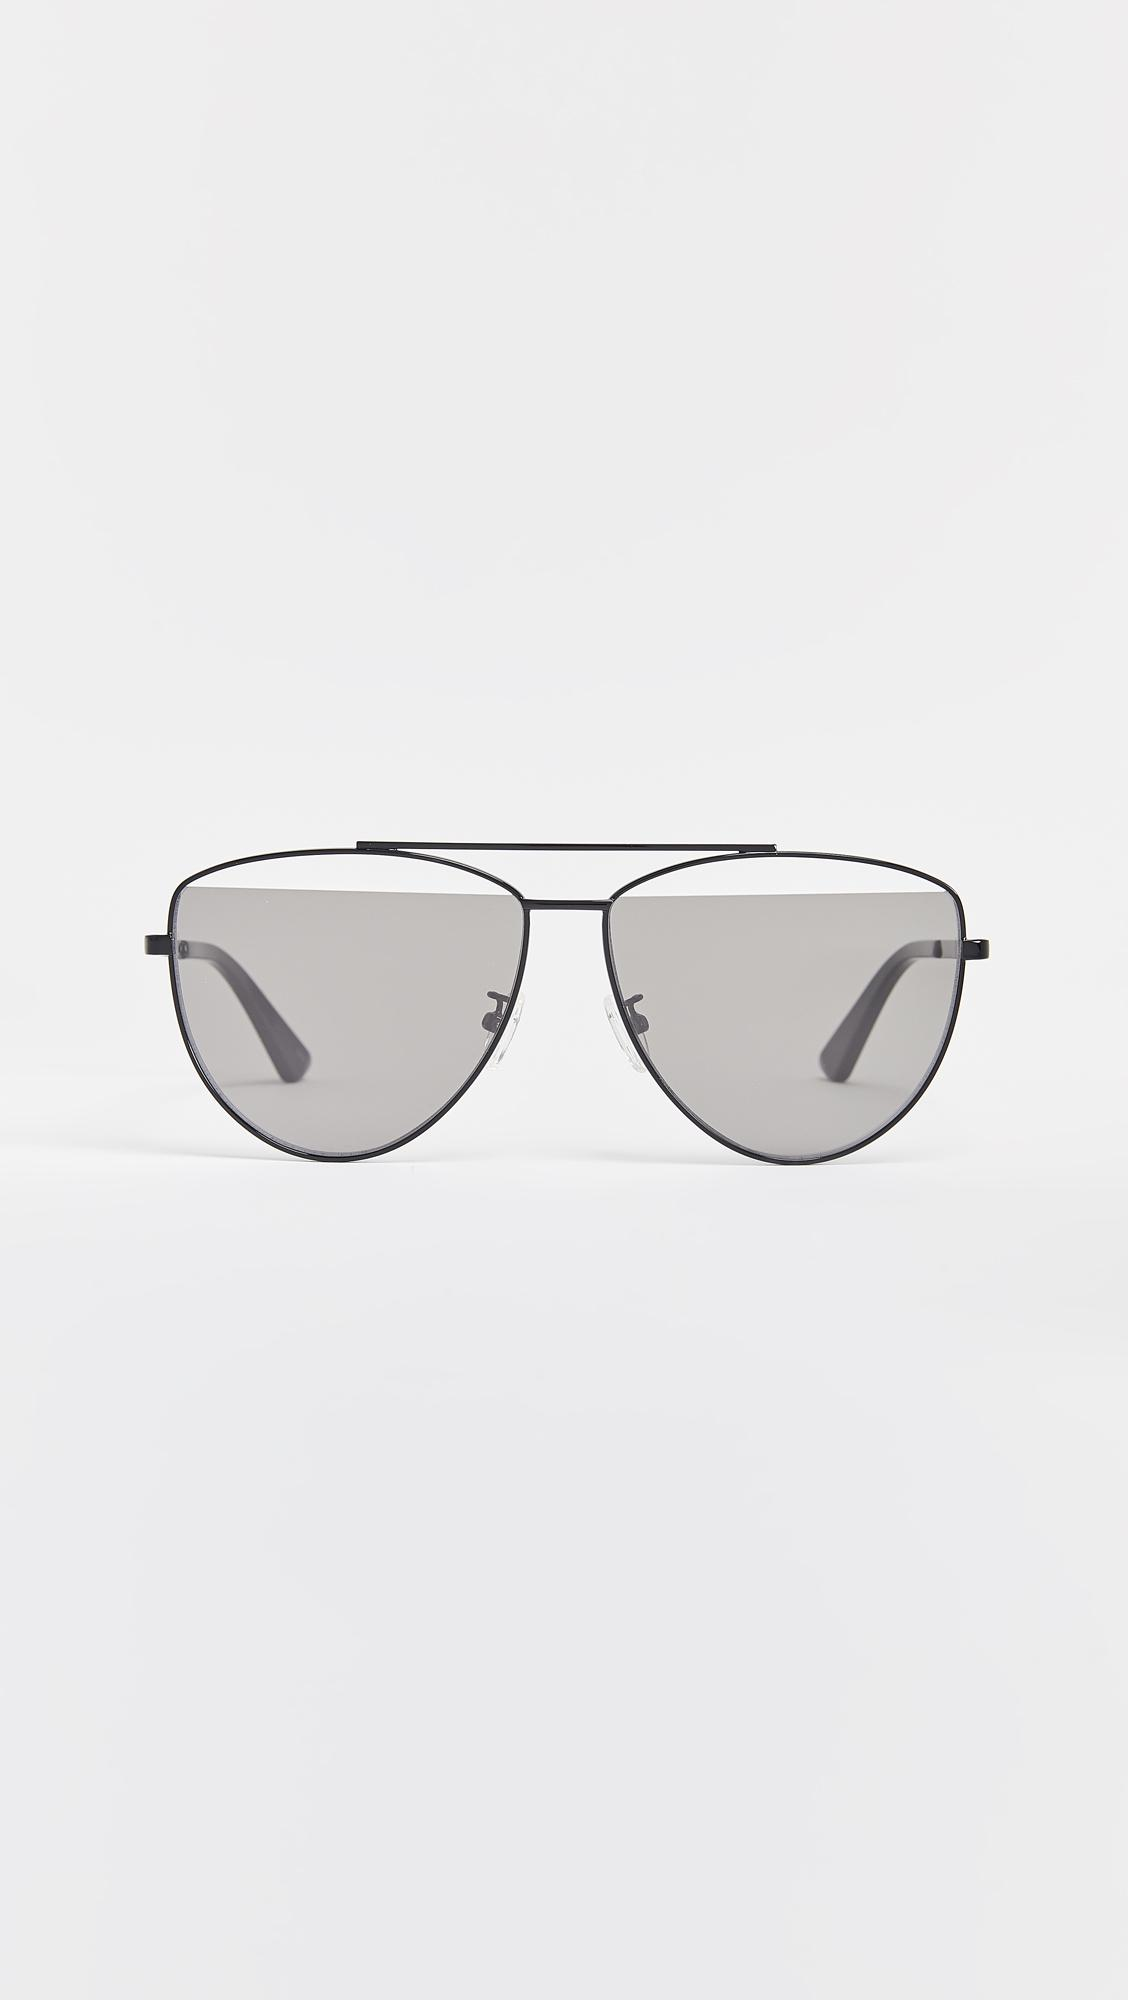 87df617d51 Mcq Alexander Mcqueen Iconic Pilot Frame Sunglasses in Gray - Lyst